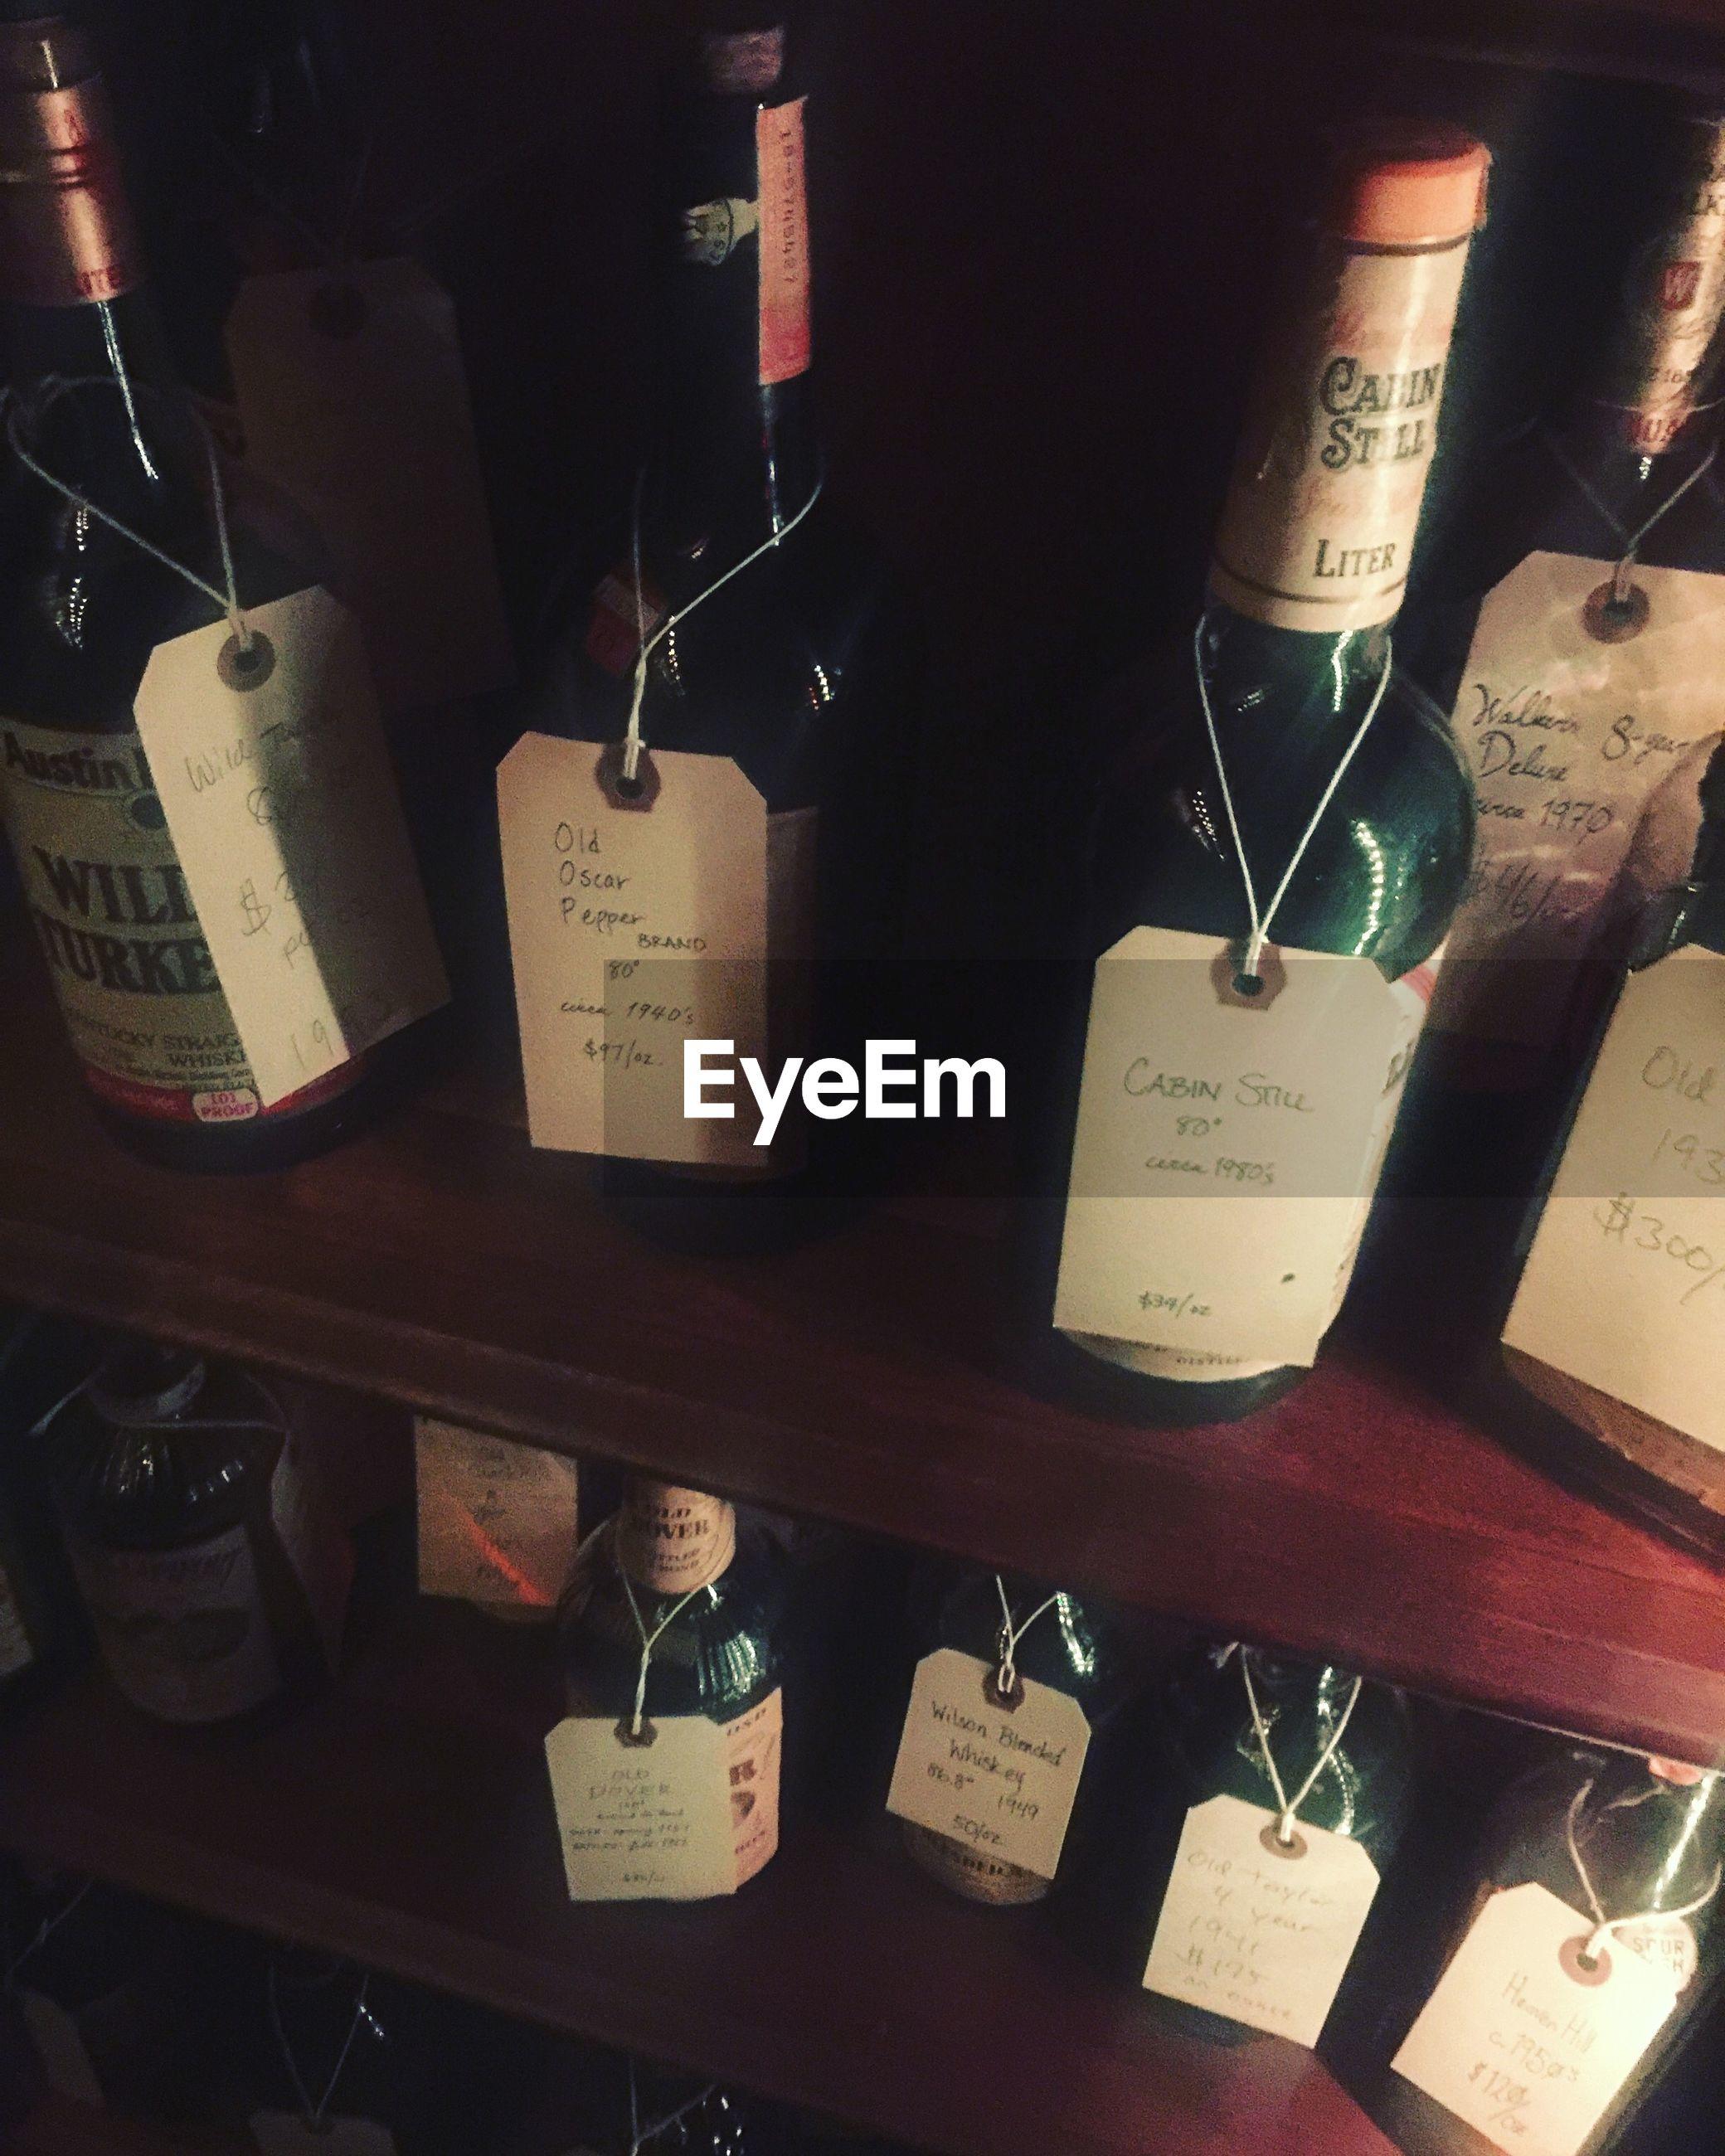 CLOSE-UP OF WINE BOTTLES HANGING IN SHELF